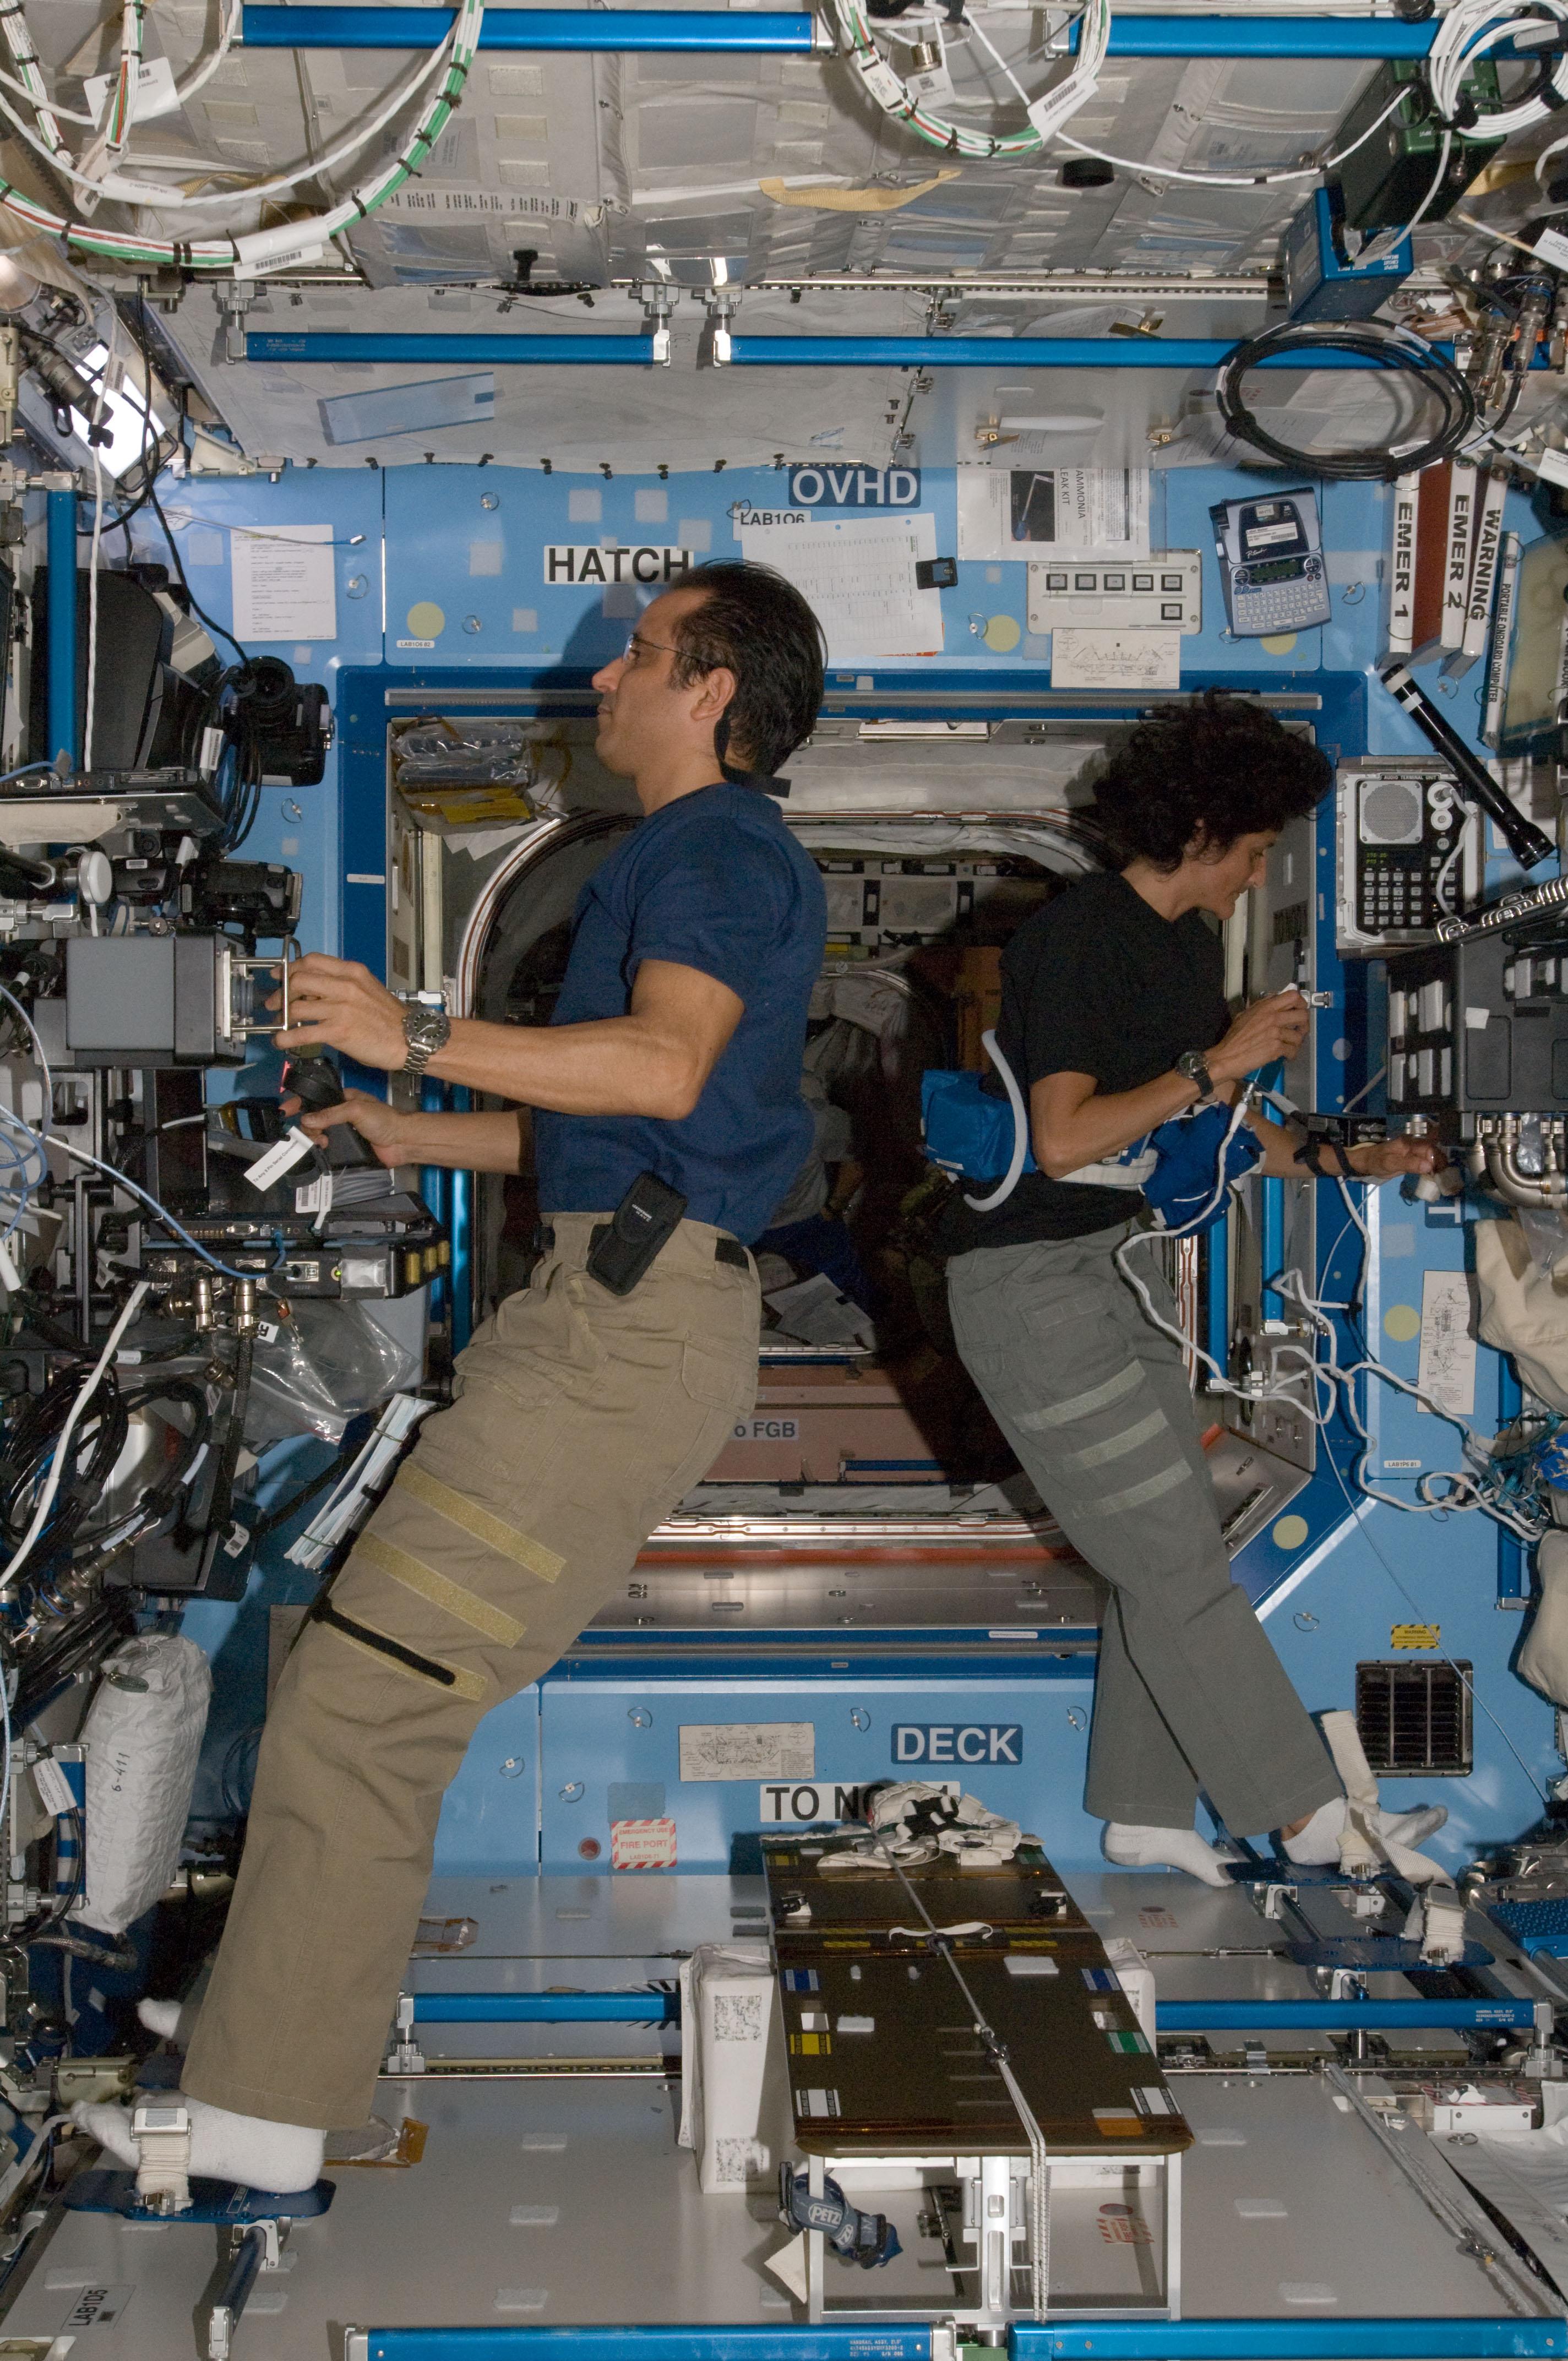 NASA - Joe Acaba and Sunita Williams